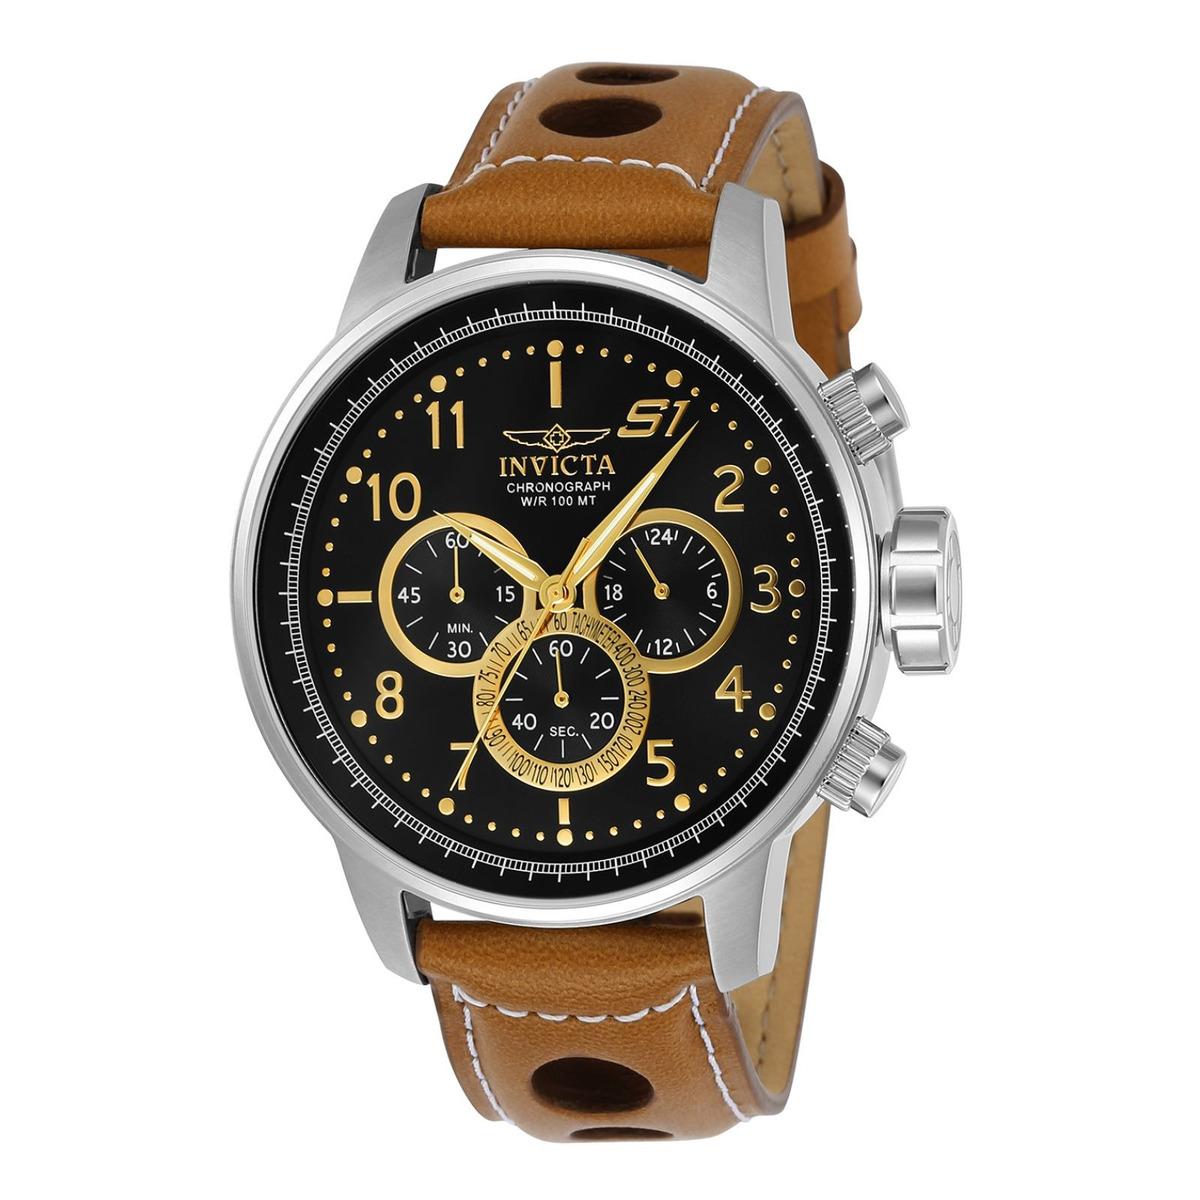 55d3065ce56e Reloj Invicta 23597 Cuero Marron Hombre -   379.900 en Mercado Libre